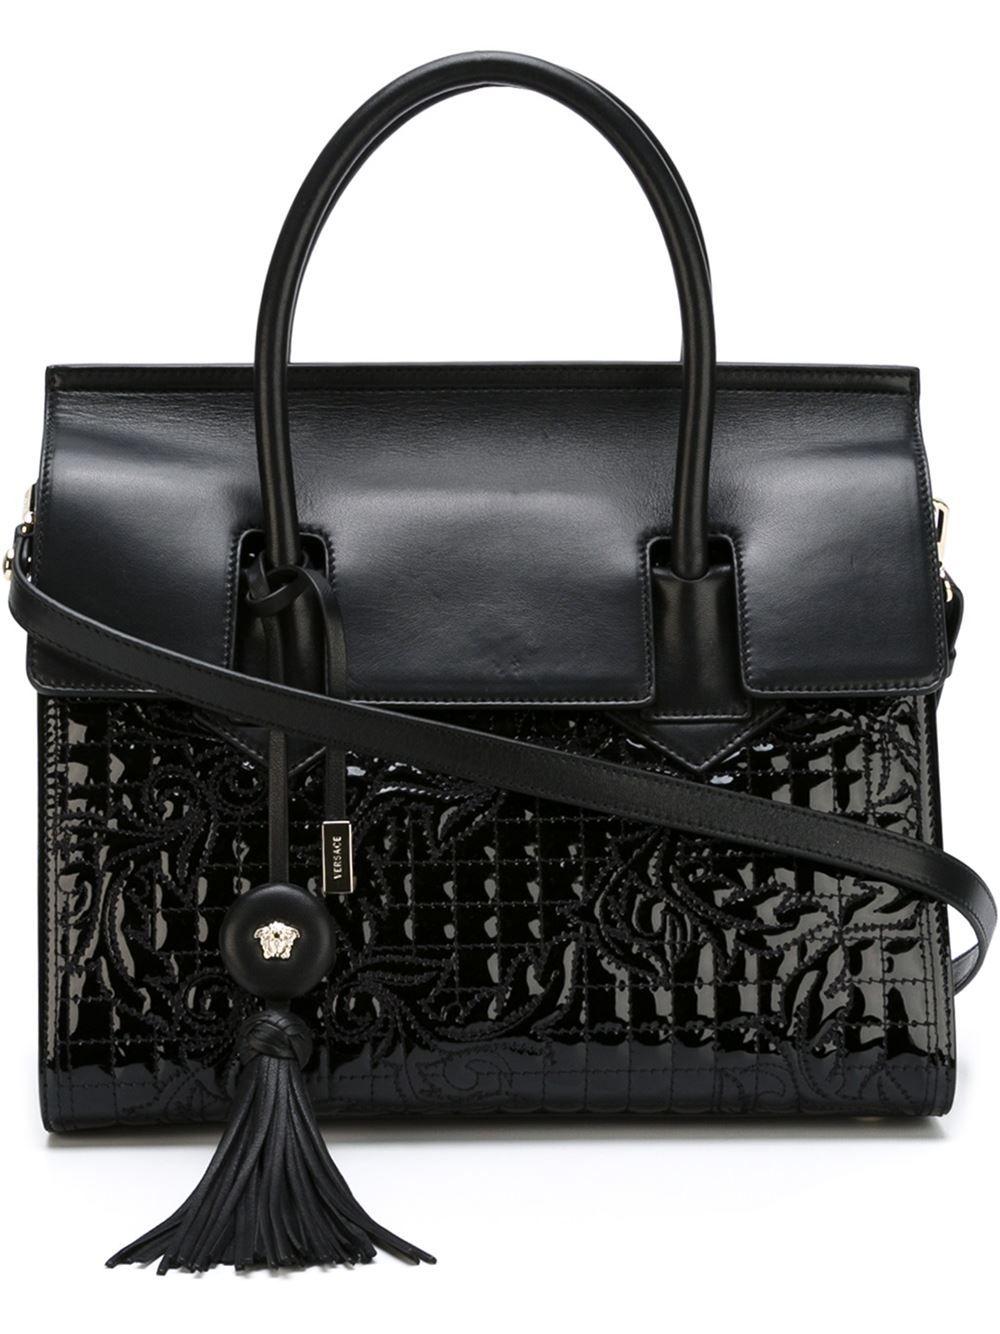 Versace 'vanitas' Tassel Tote - Elite - Farfetch.com